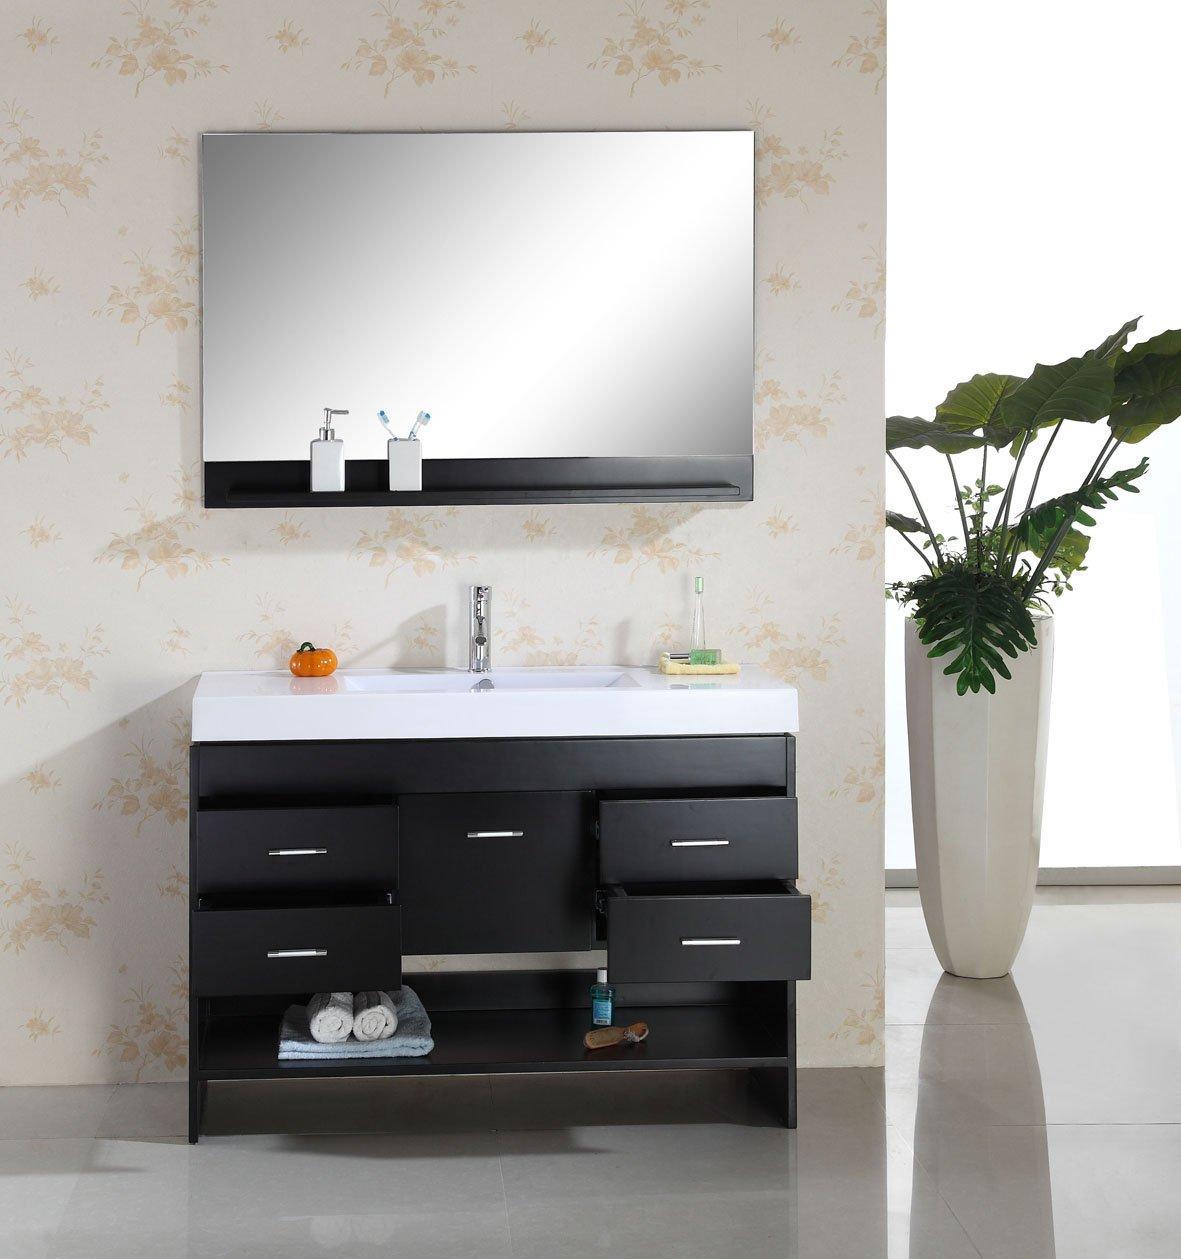 Virtu Usa Ms 575 C Es Gloria 48 Inch Single Sink Bathroom Vanity